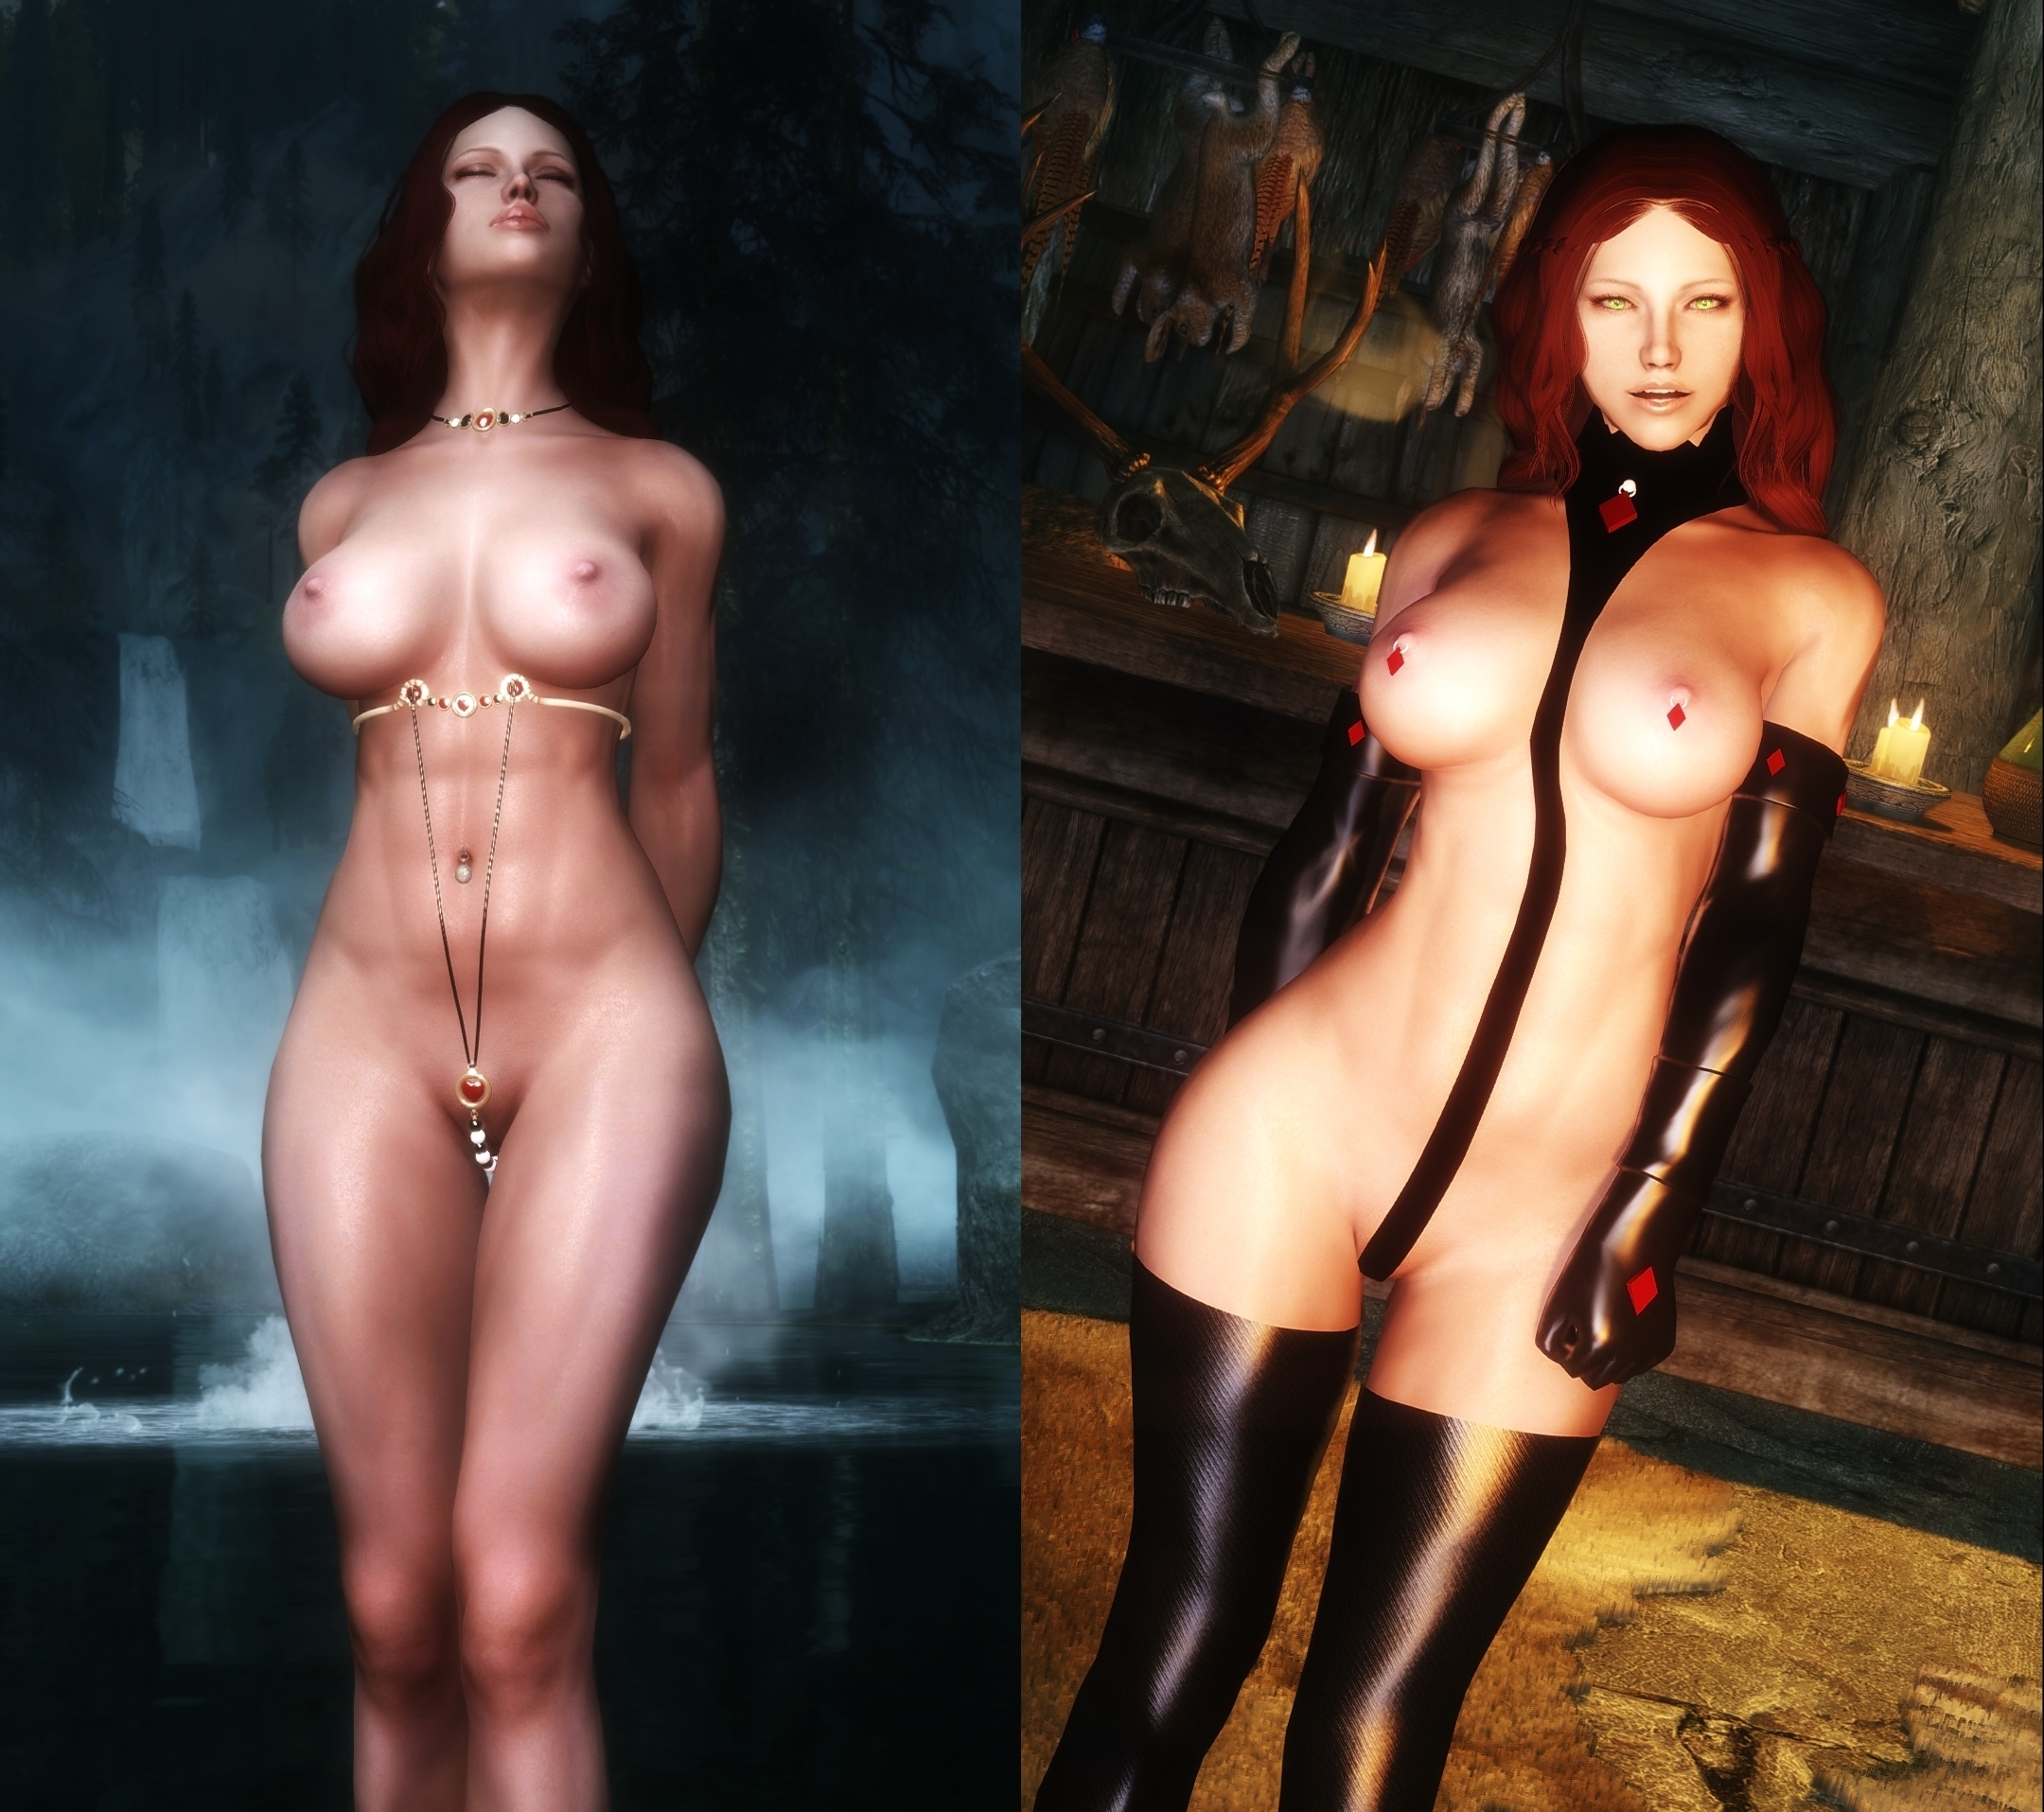 2 hot girls 696 - 3 8